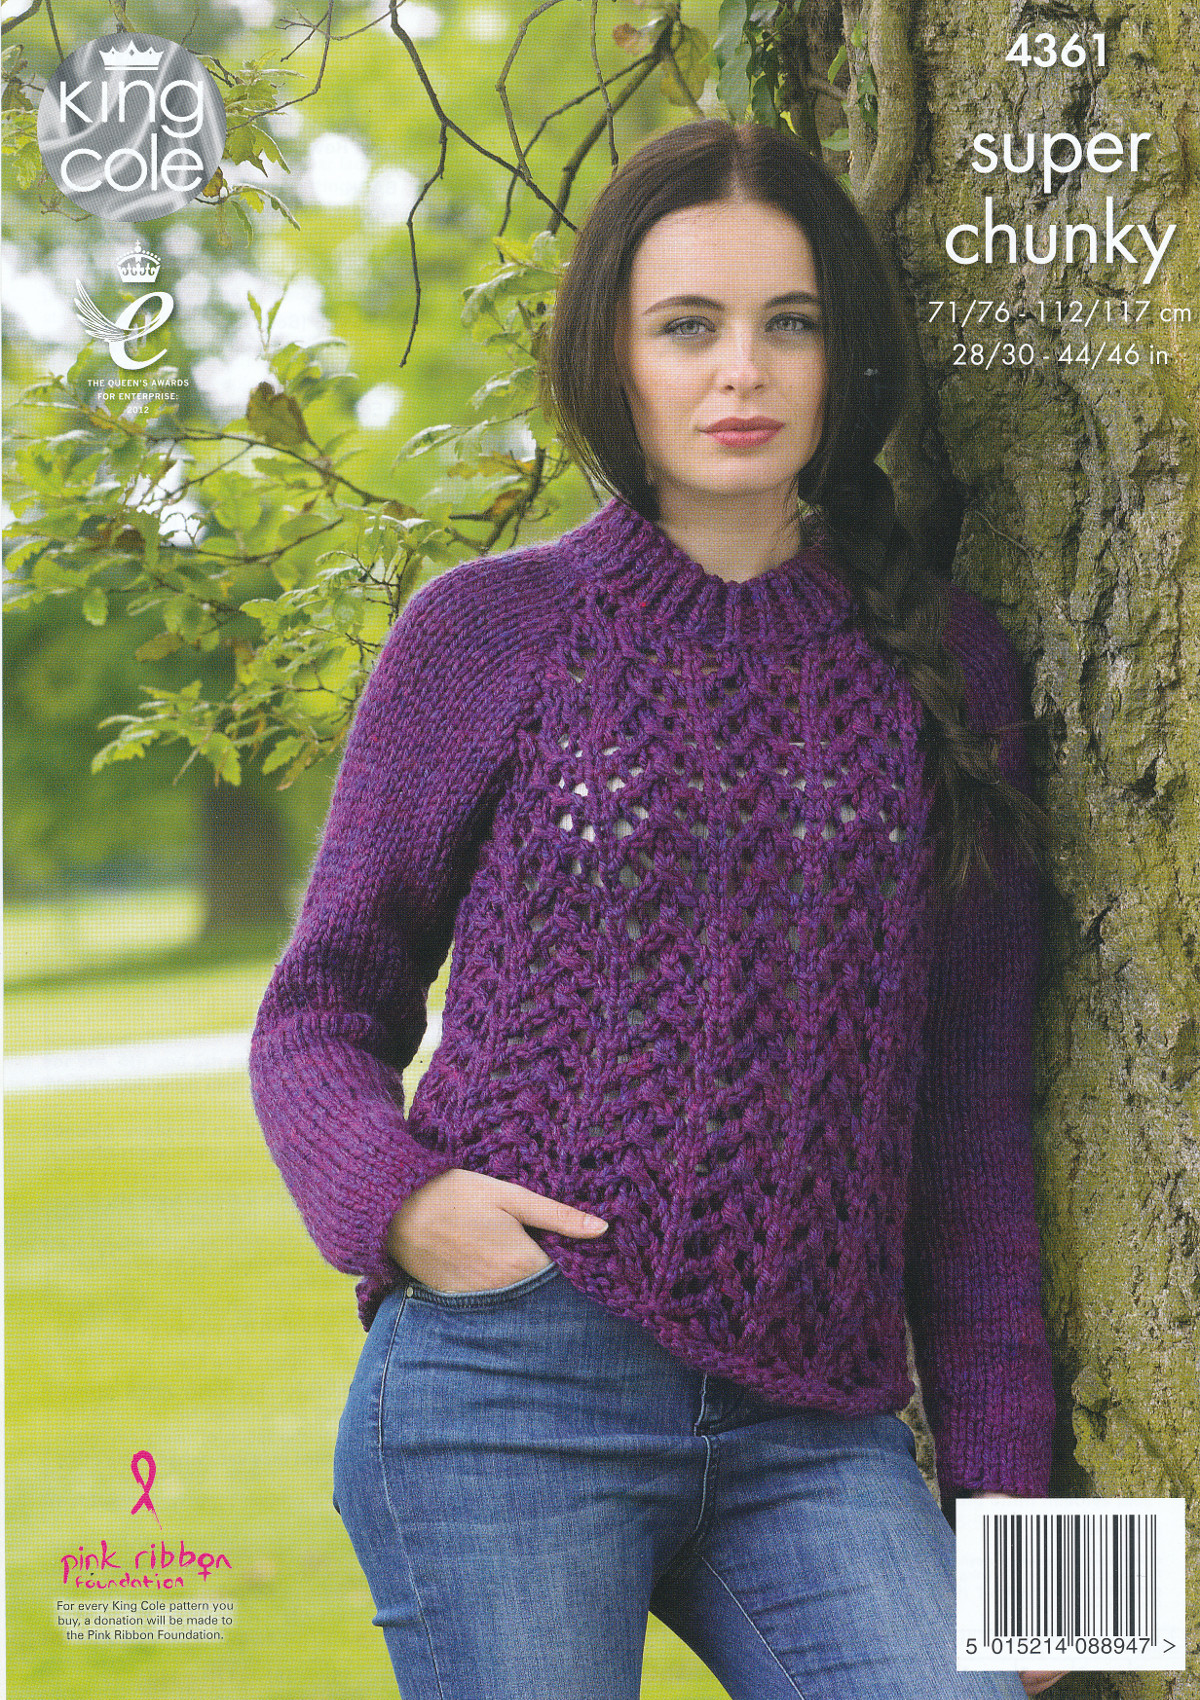 King Cole Knitting Pattern 3318 : Lace Effect Sweater Cardigan Knitting Pattern King Cole Ladies Super Chunky 4...